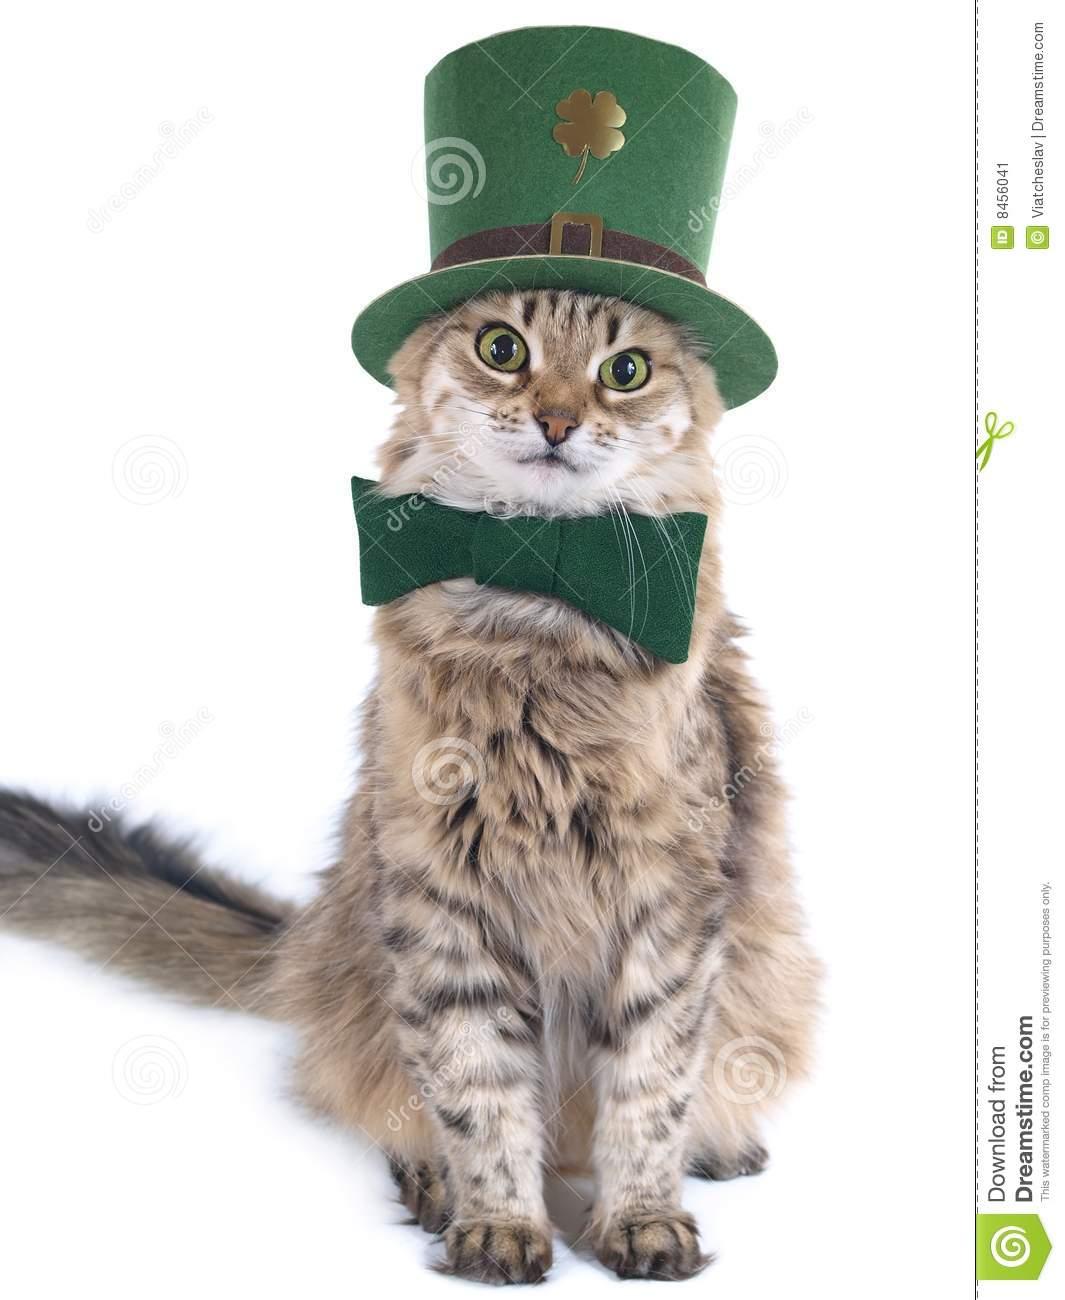 Cat Wallpapers For Iphone: [36+] St Patrick's Day Cat Wallpaper On WallpaperSafari